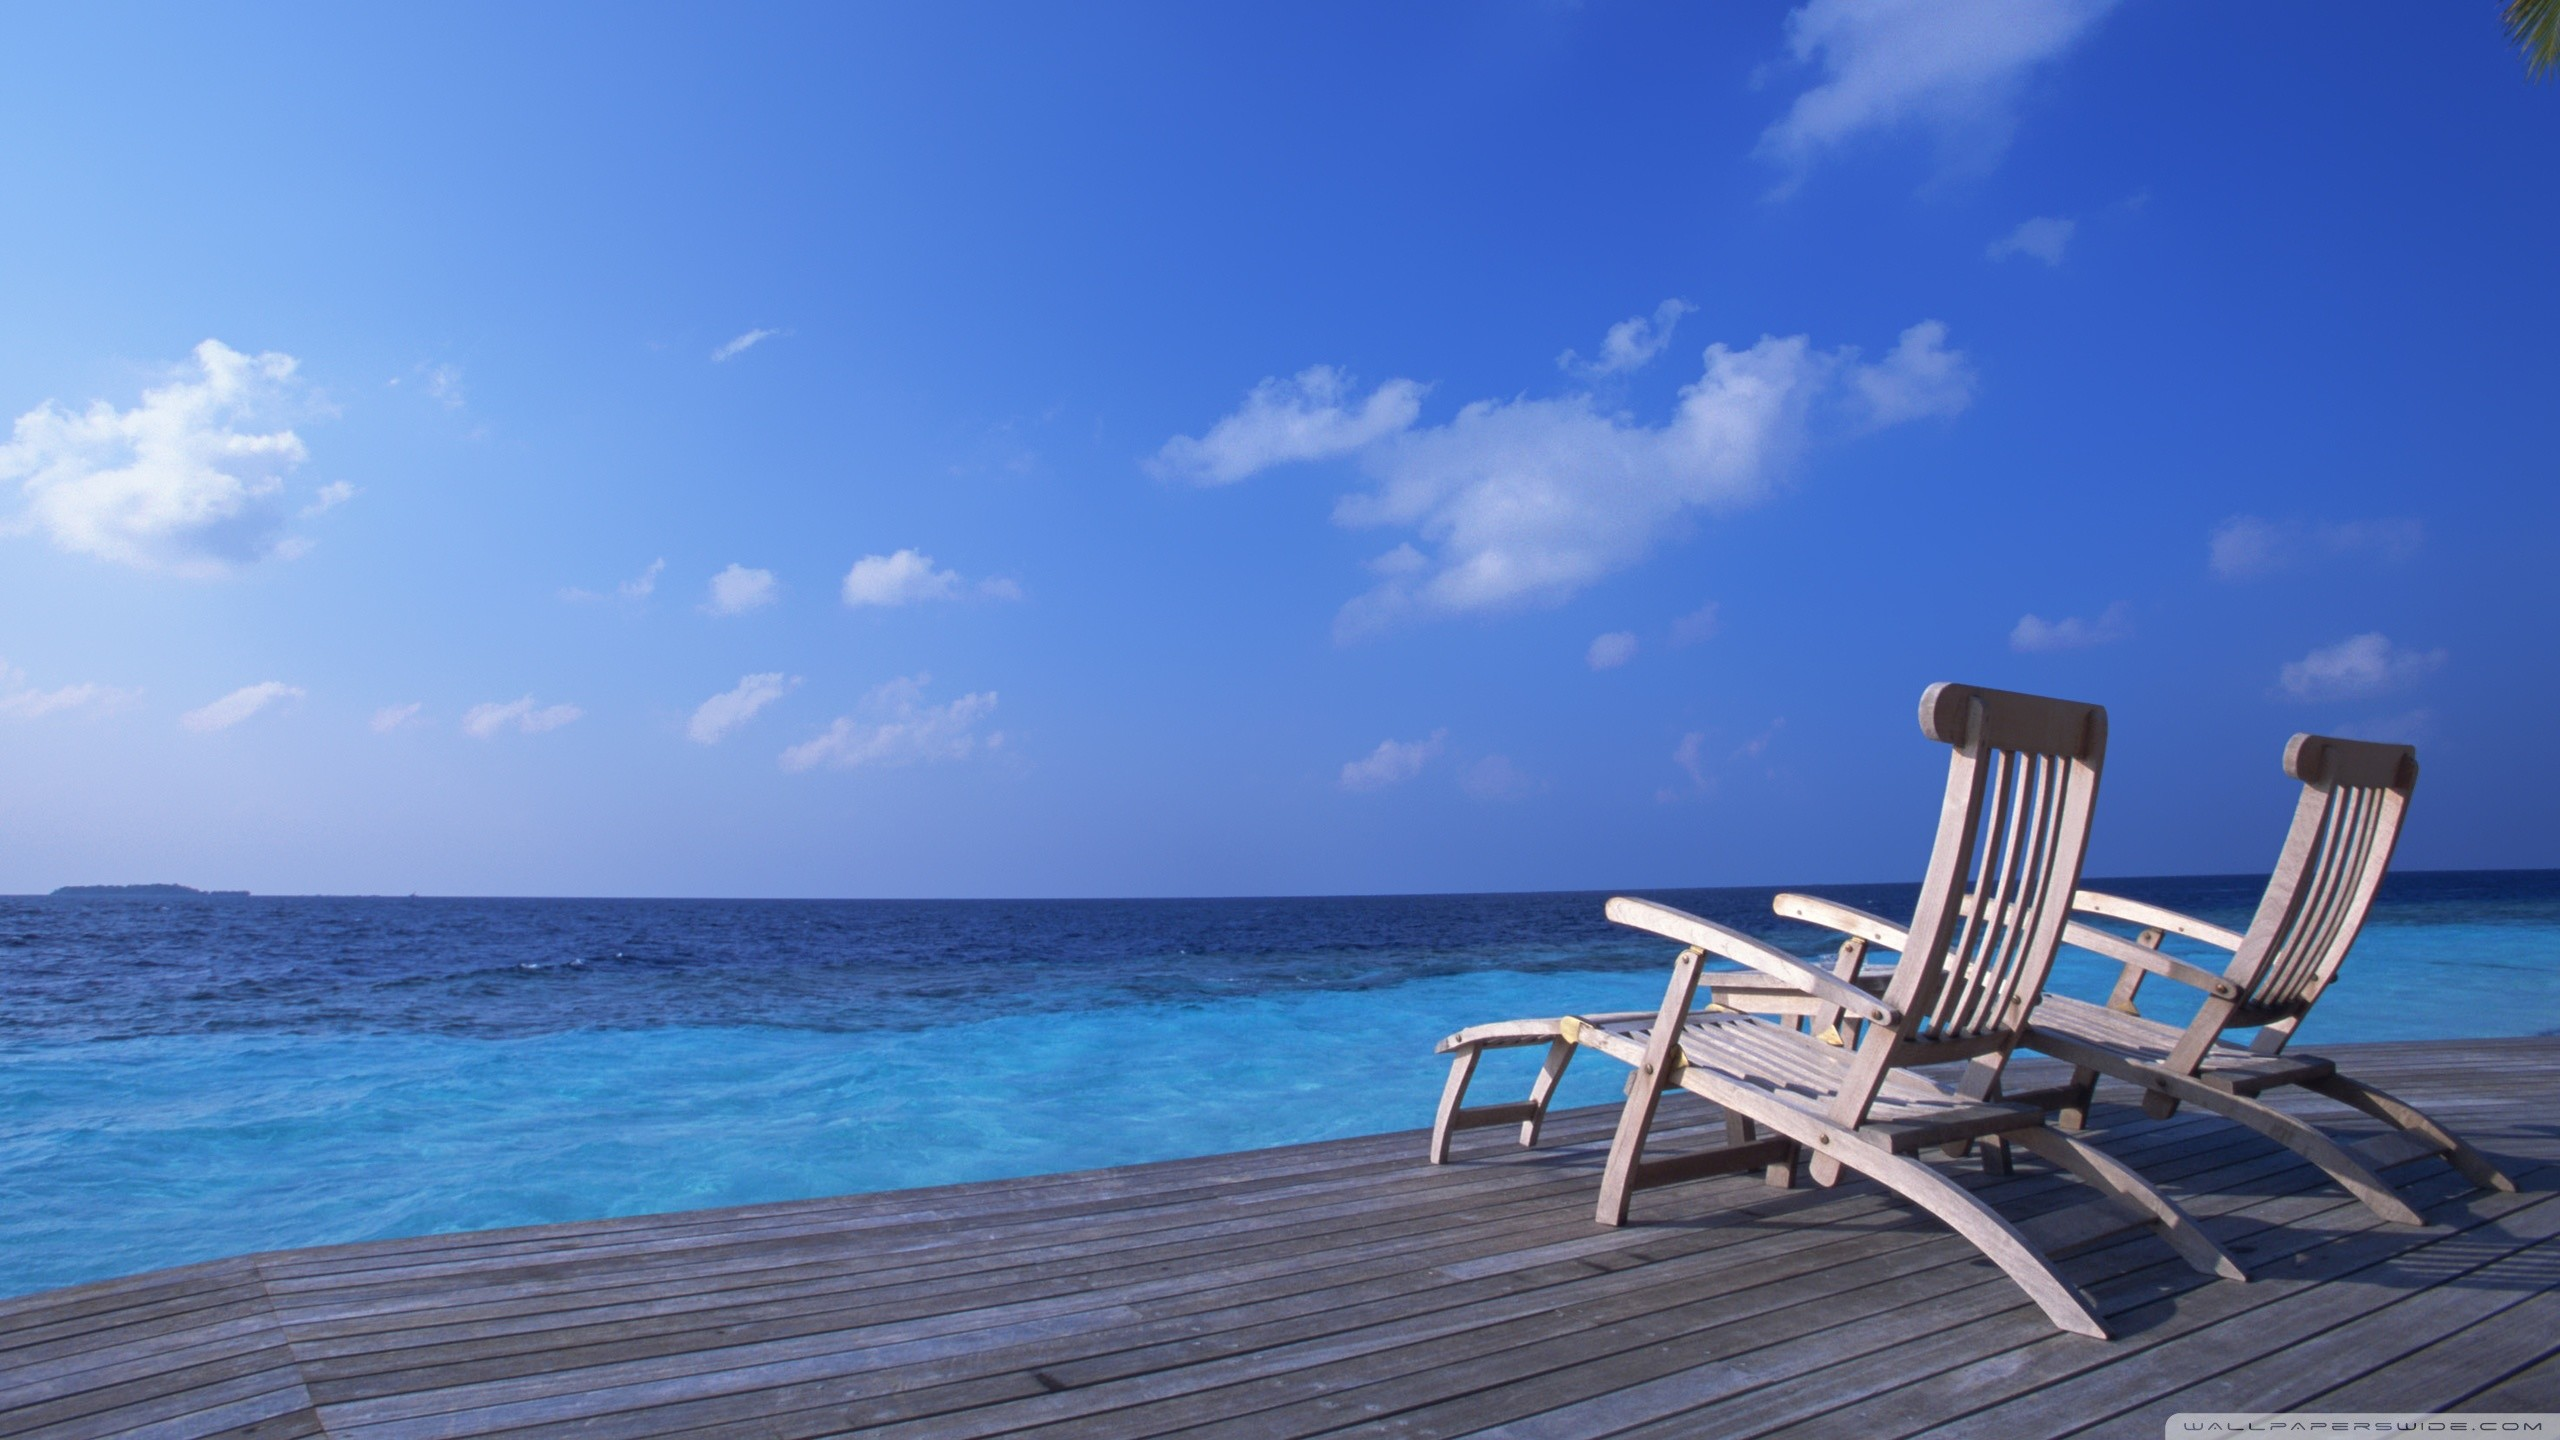 Hd Tropical Island Beach Paradise Wallpapers And Backgrounds: Tropical Island Desktop Wallpaper ·① WallpaperTag